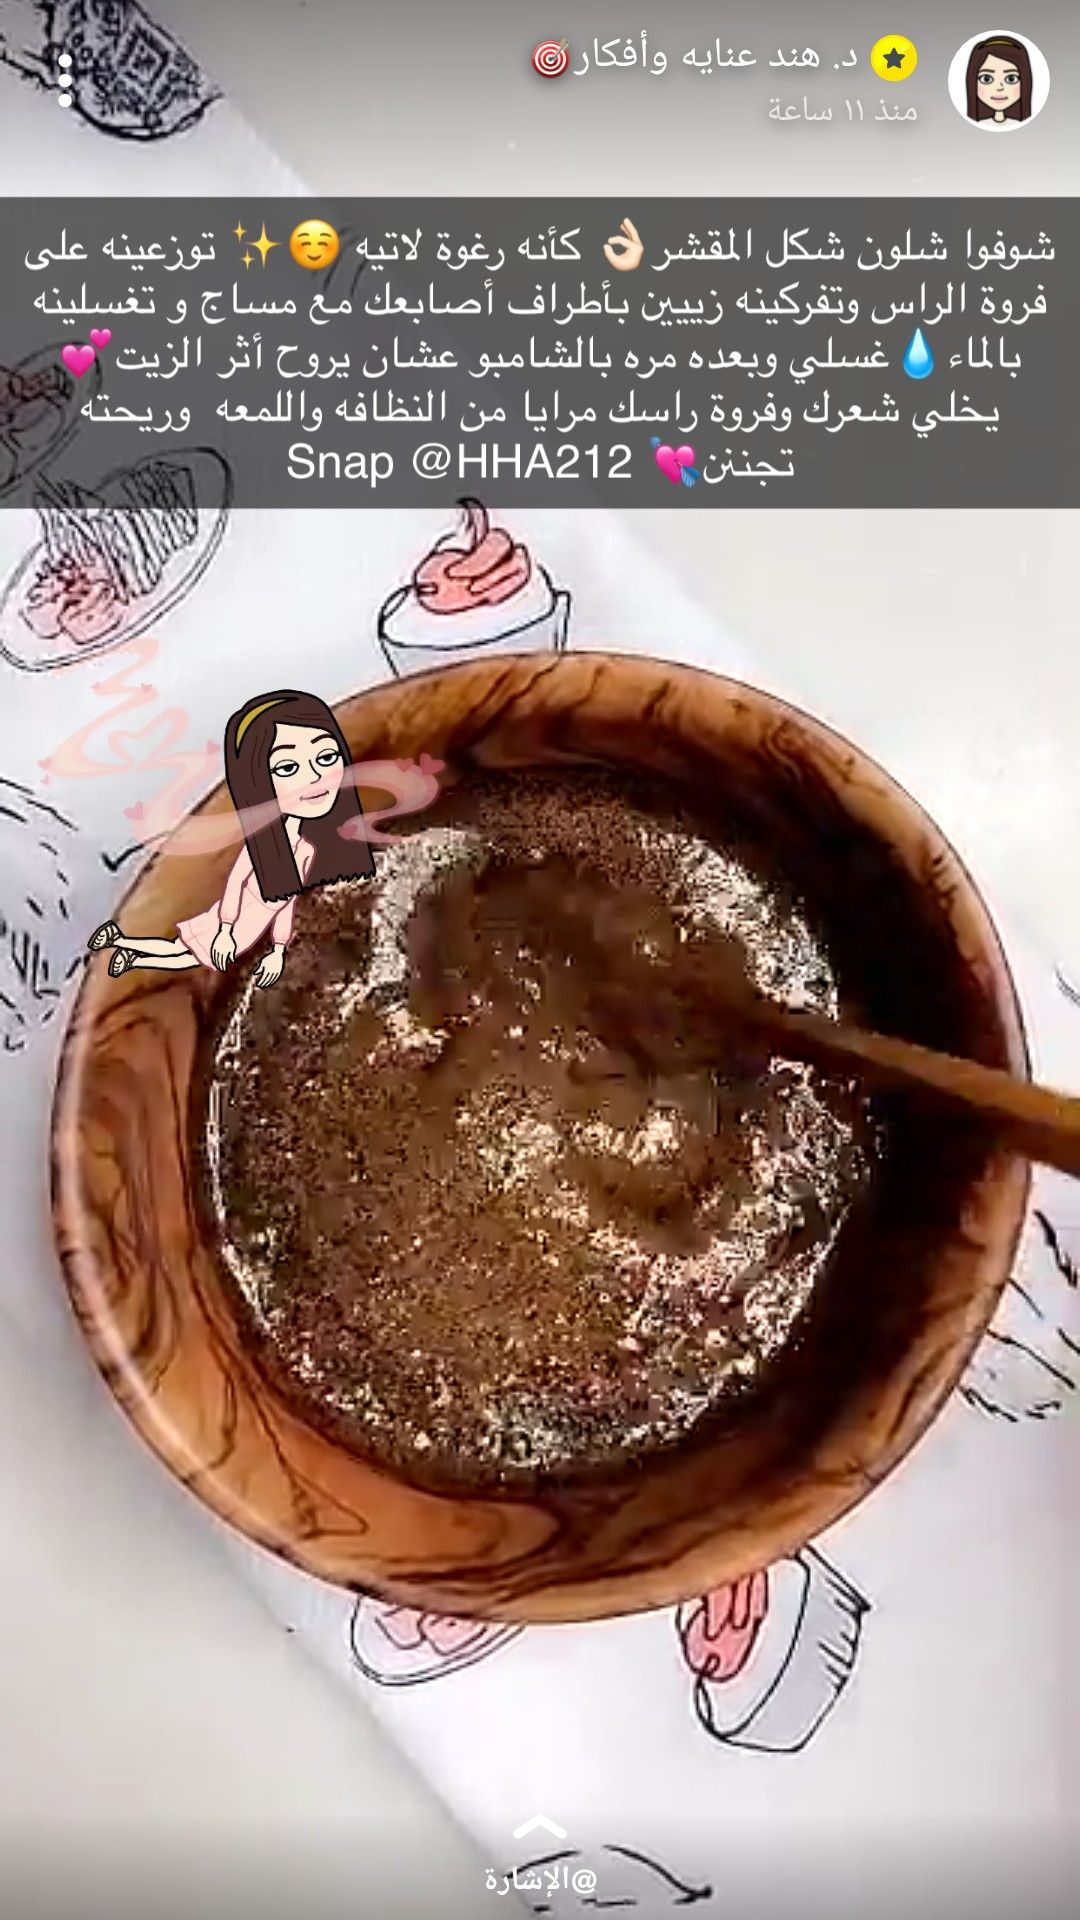 Pin By وهم On د هند عنايه وأفكار Beauty Care Beauty Skin Food